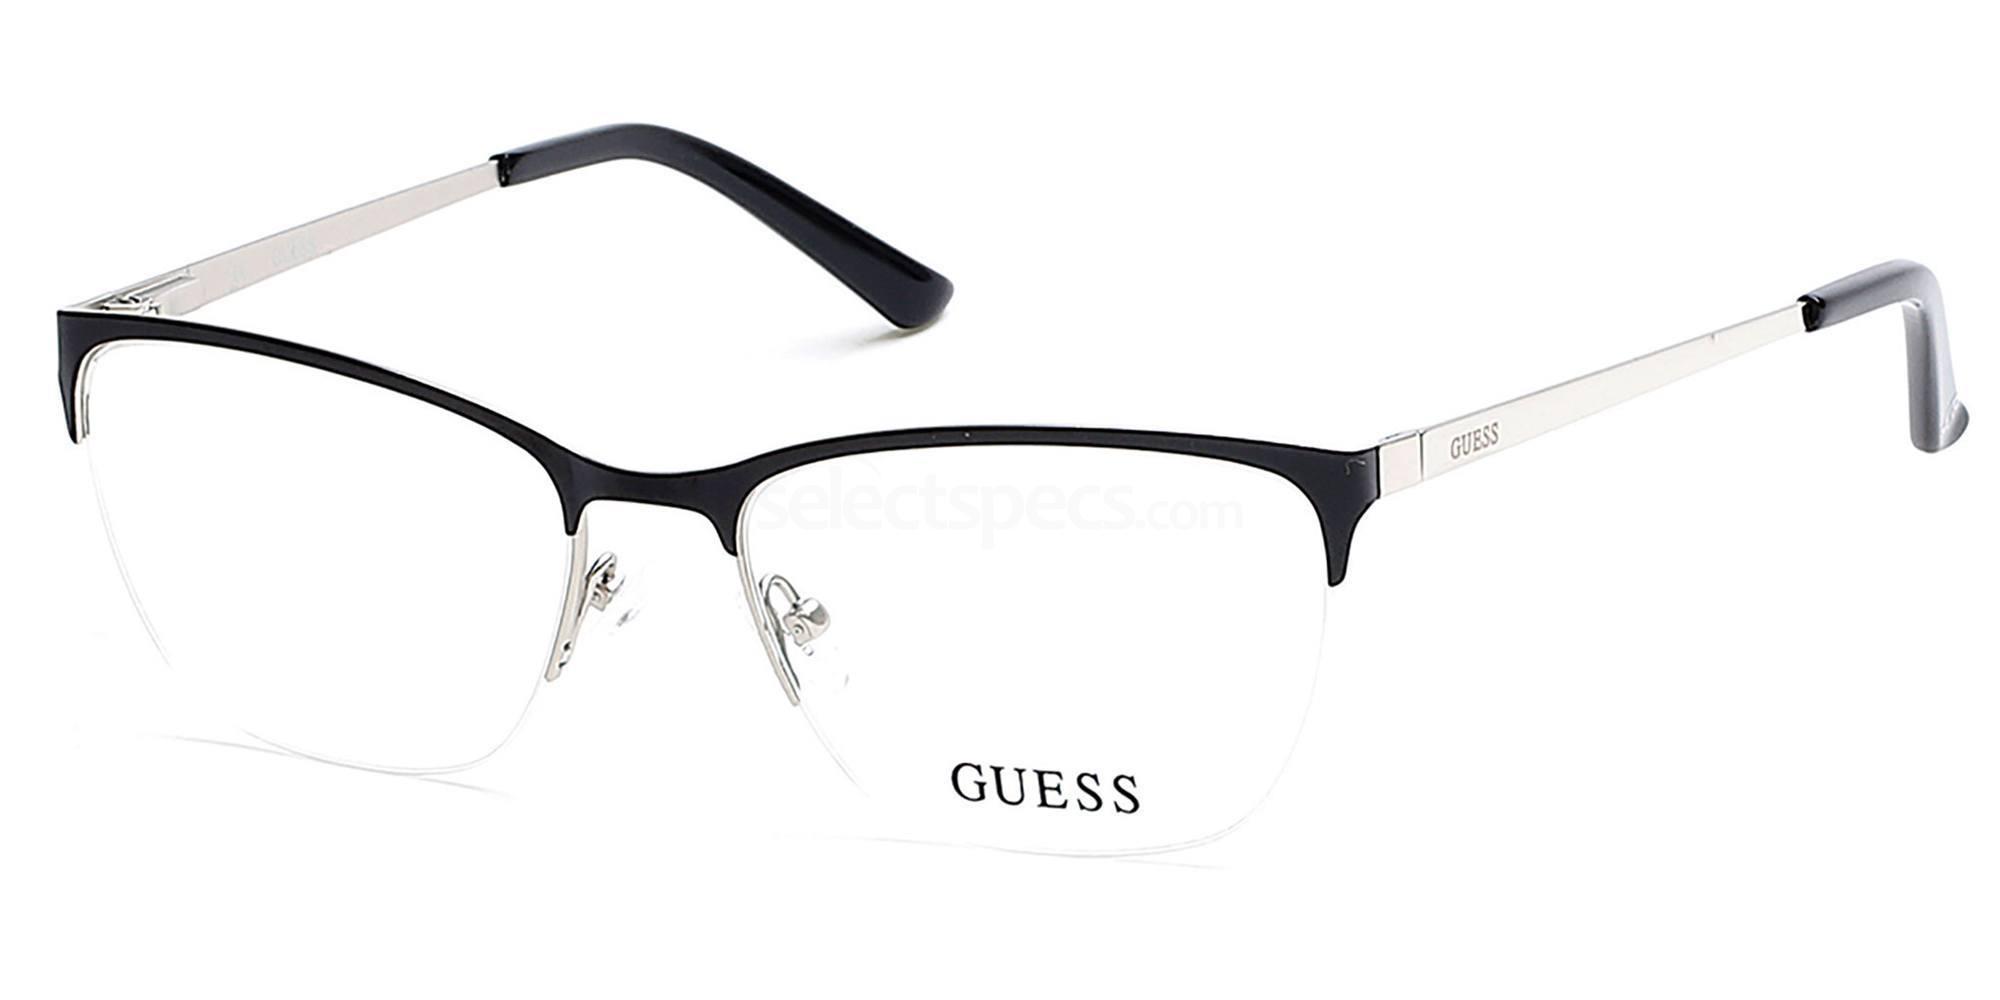 001 GU2543 Glasses, Guess